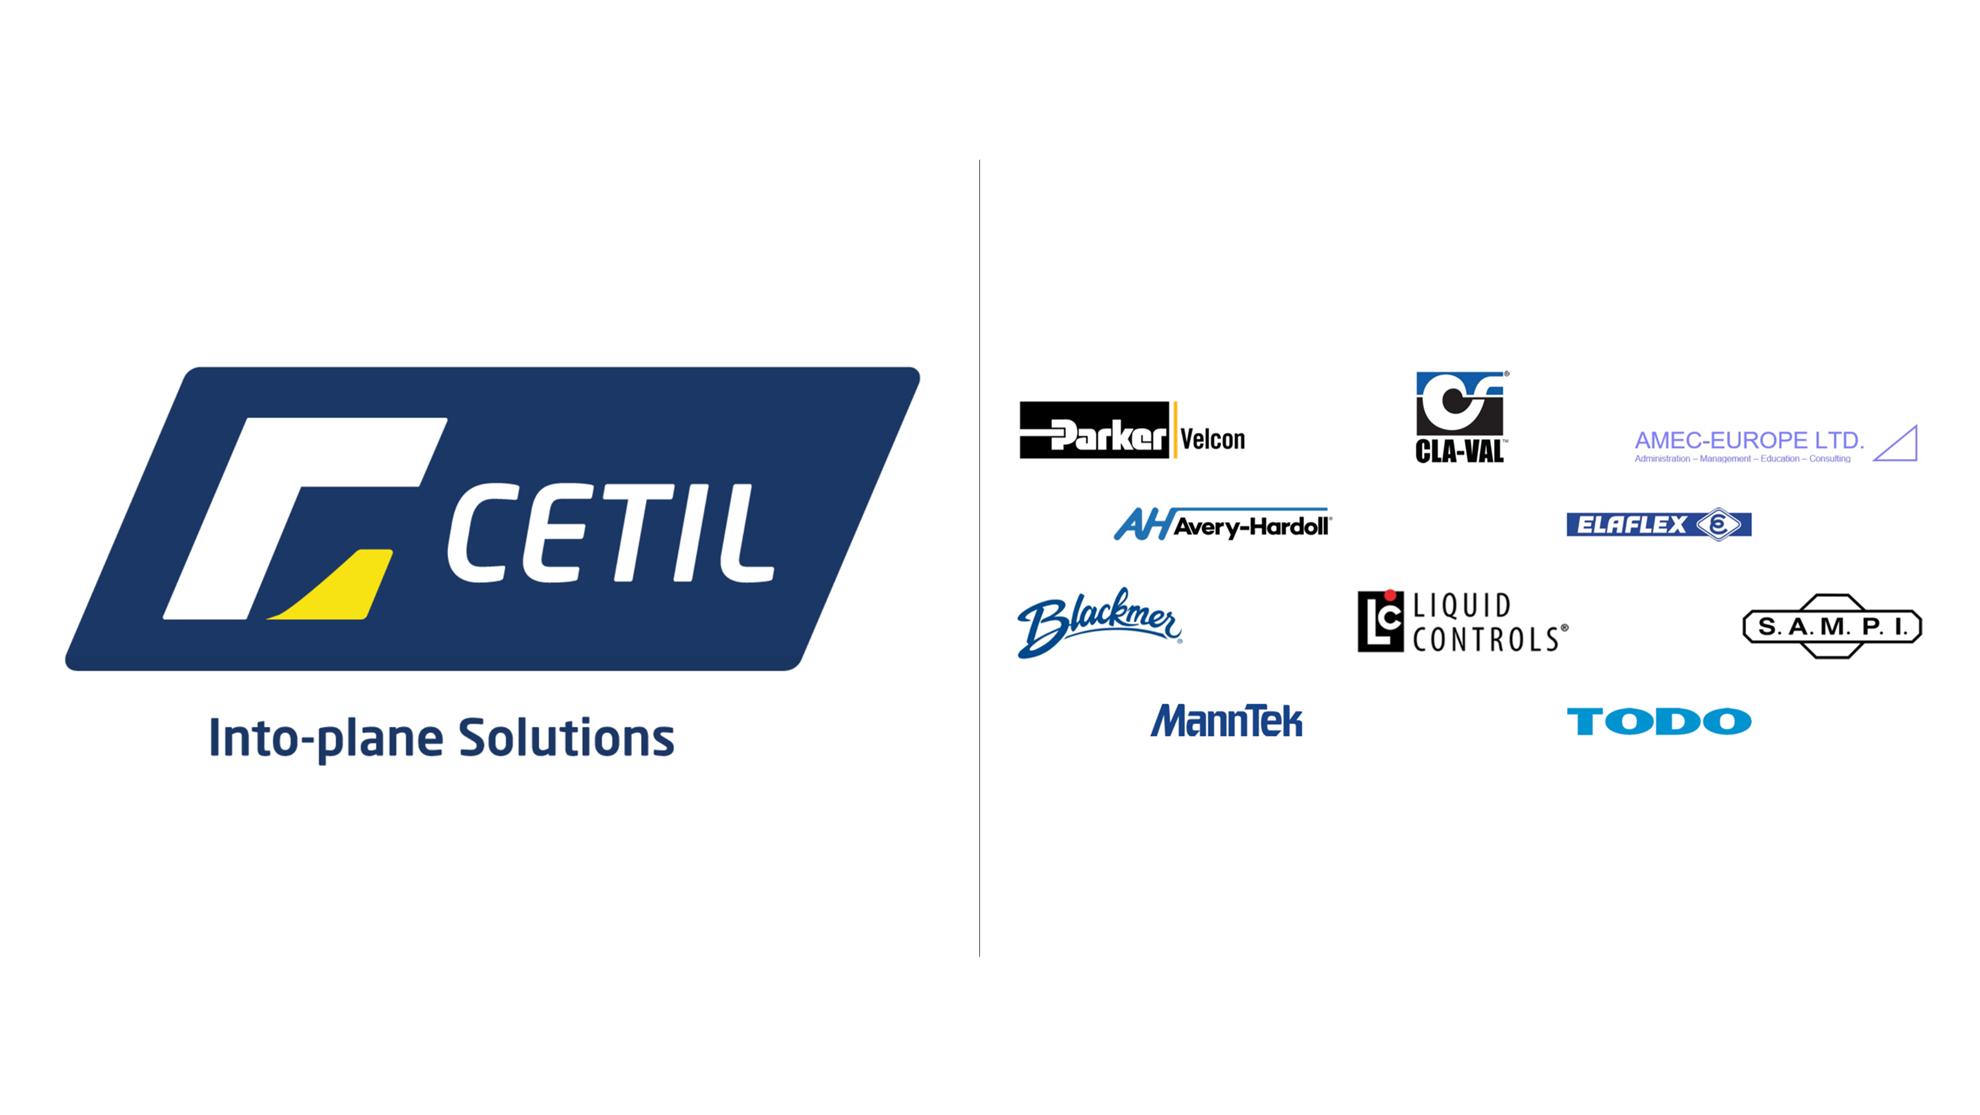 Cetil Into-plane solutions